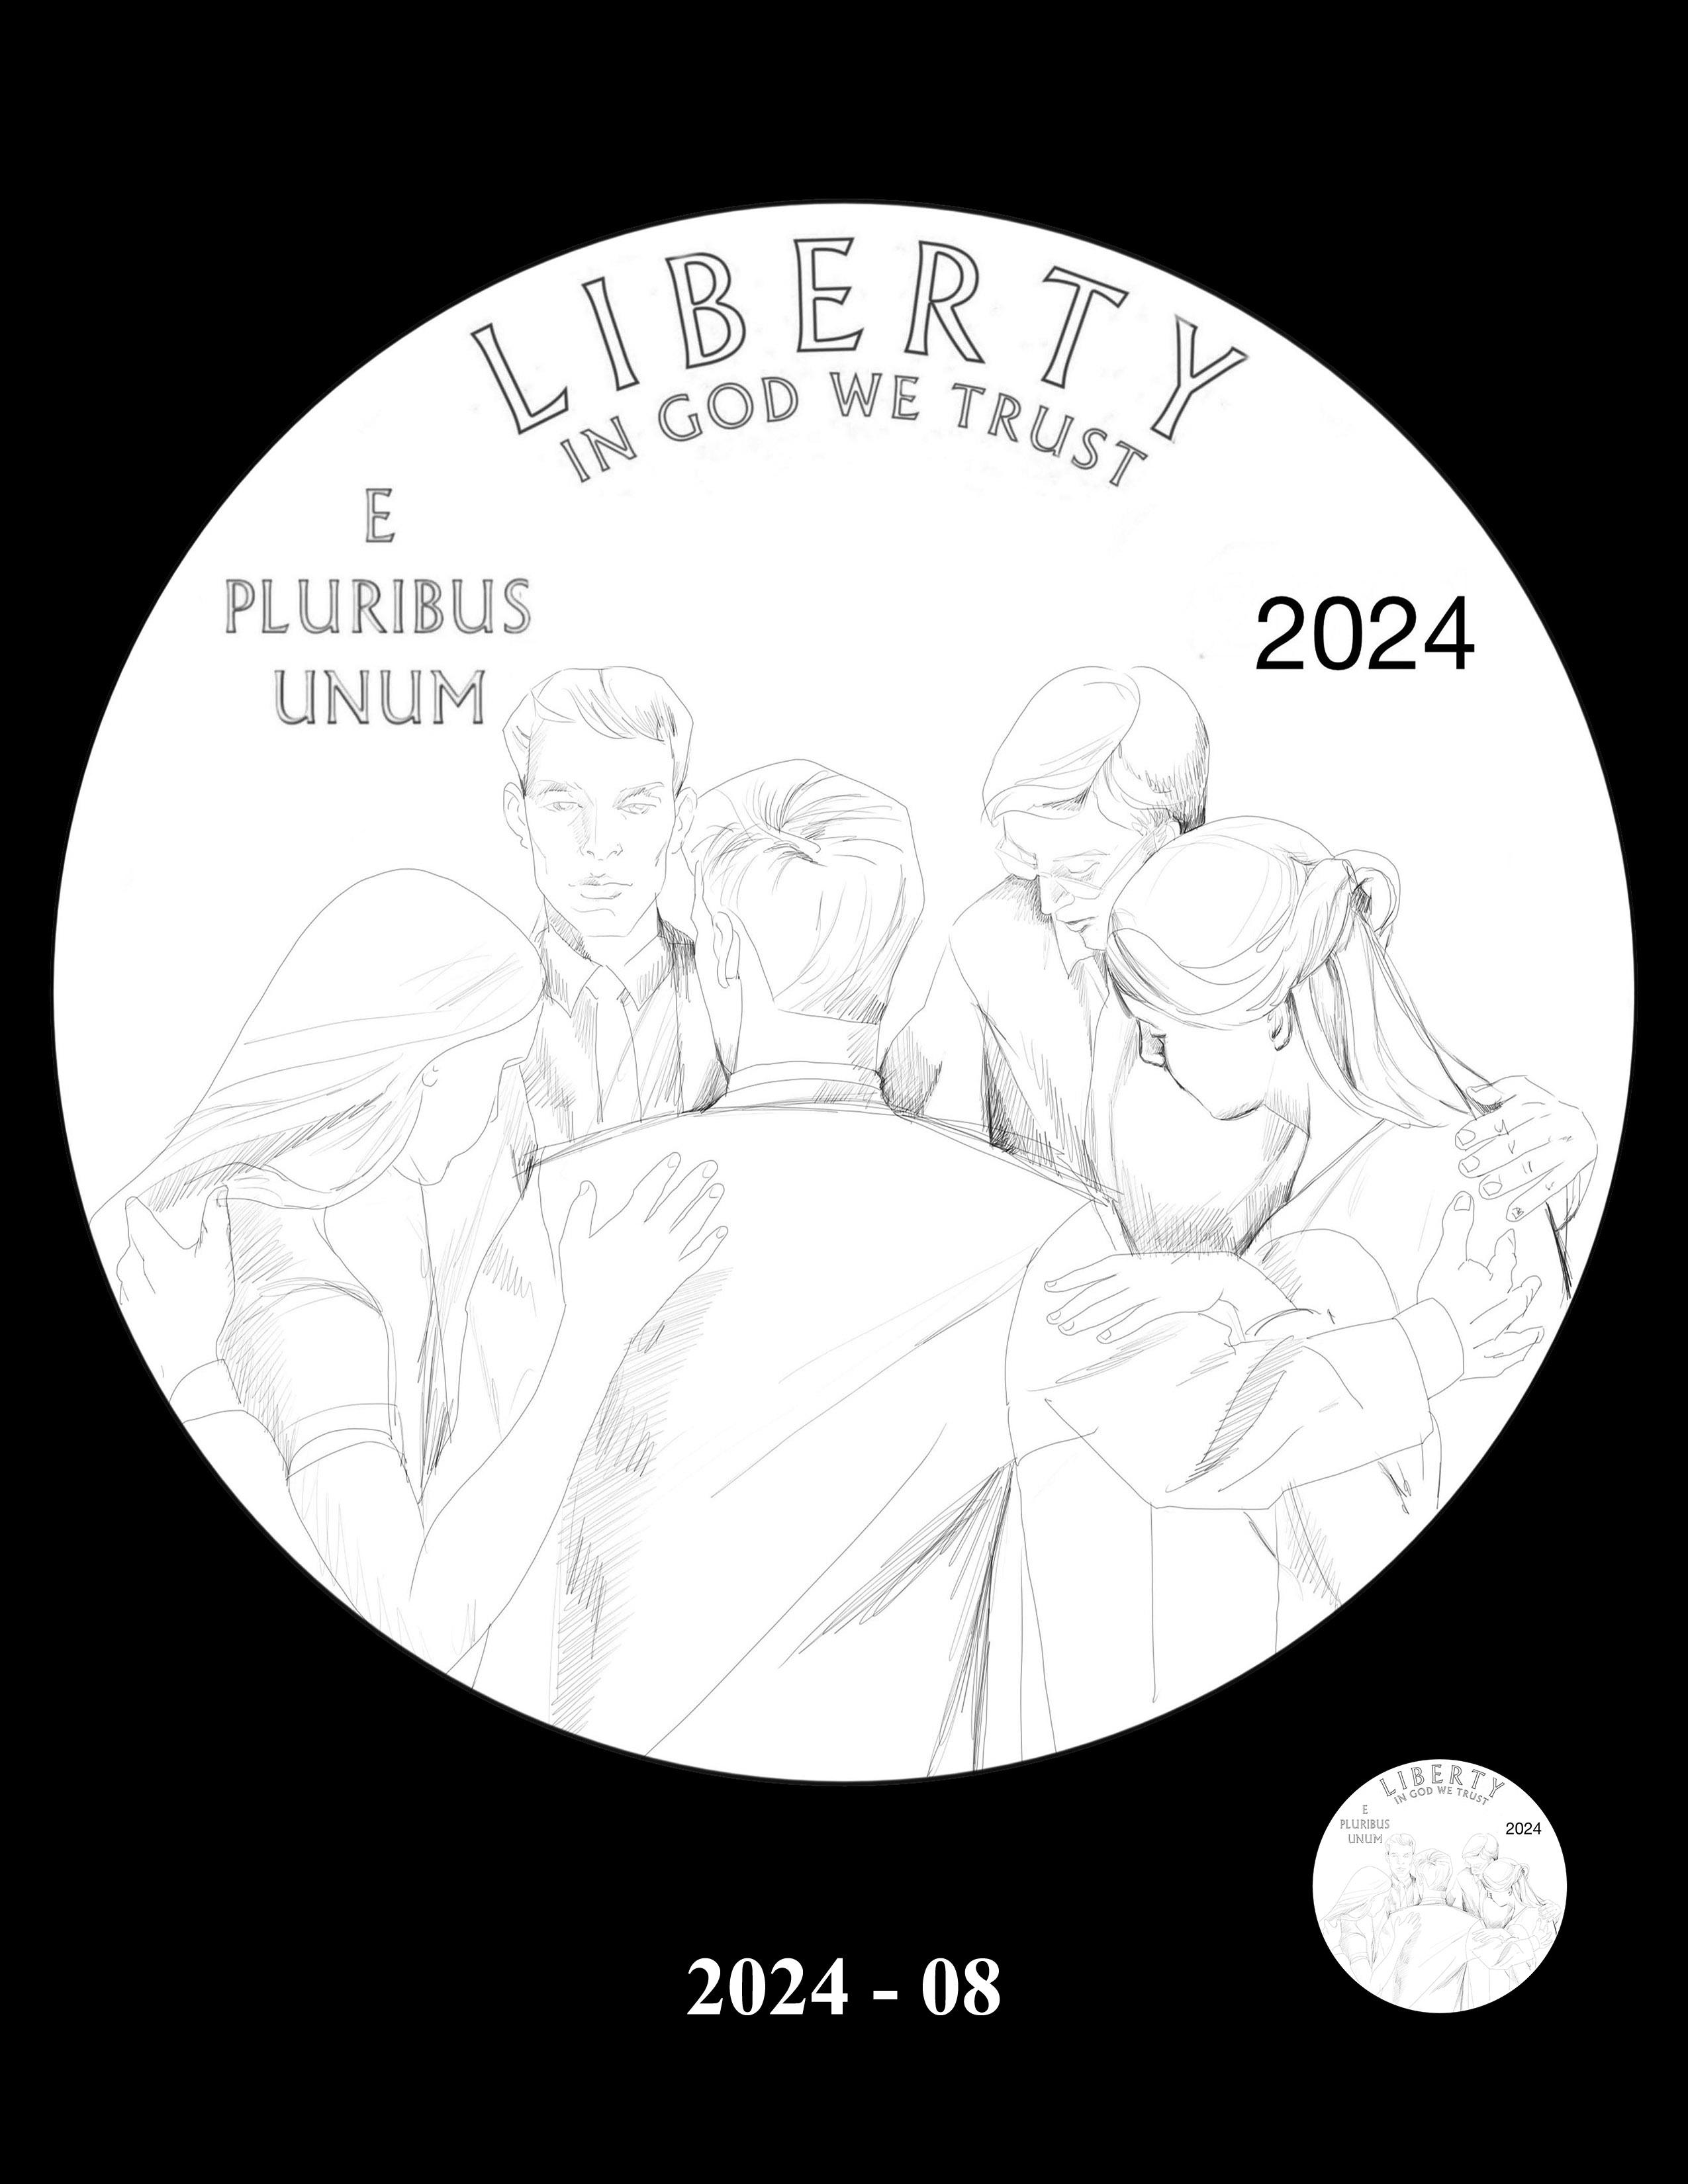 08-2024 -- 2021 - 2025 American Eagle Platinum Proof Program